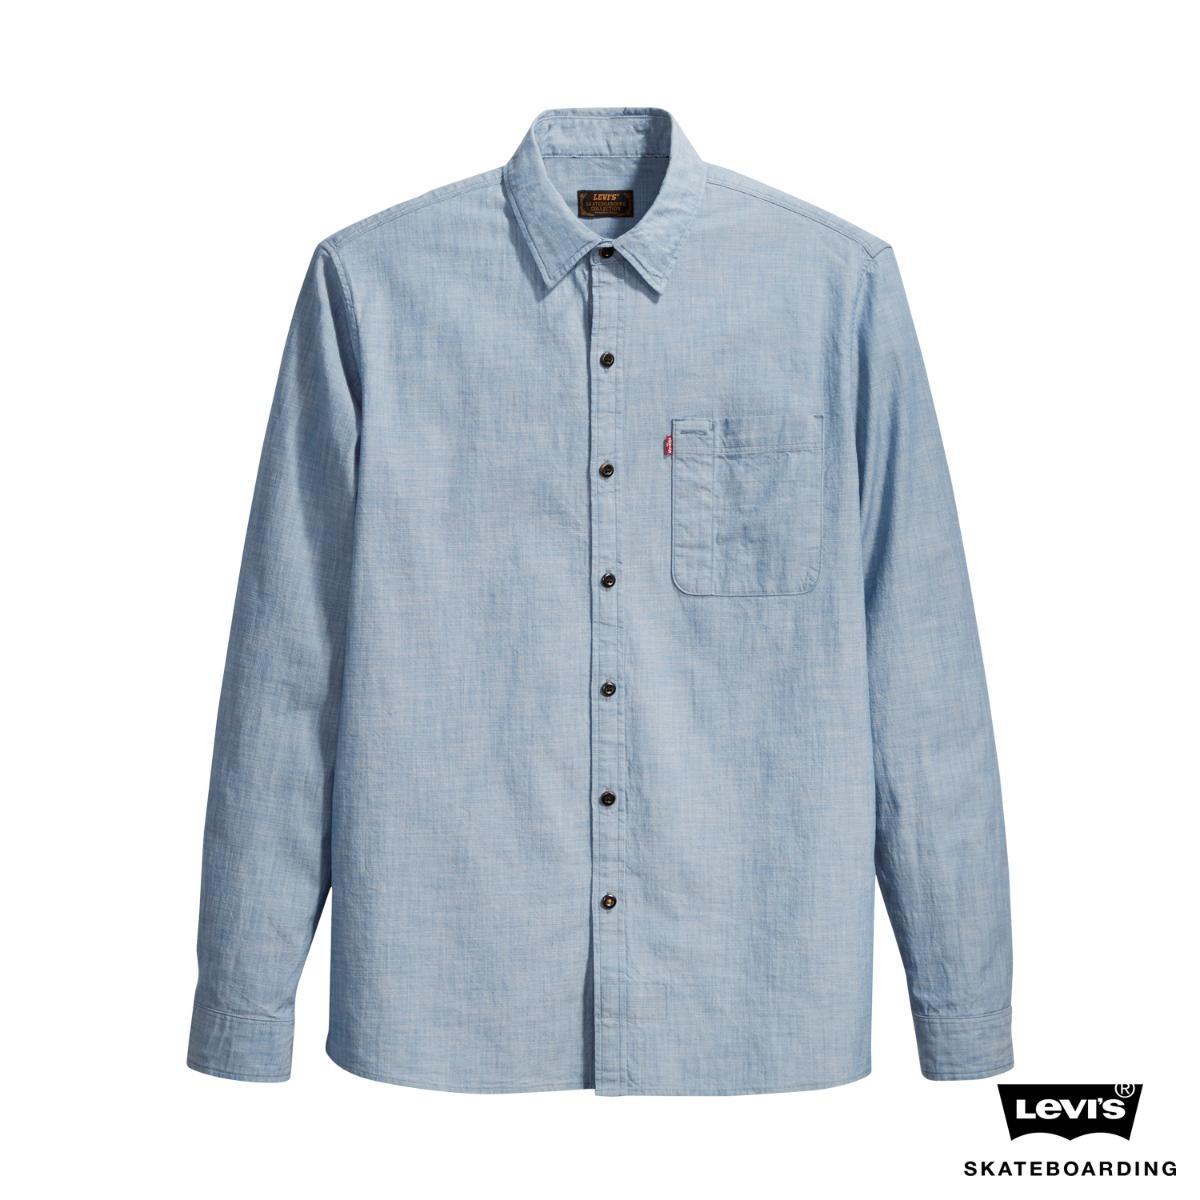 camisa jeans levis skateboarding riveter azul claro. Carregando zoom. f540c702f29